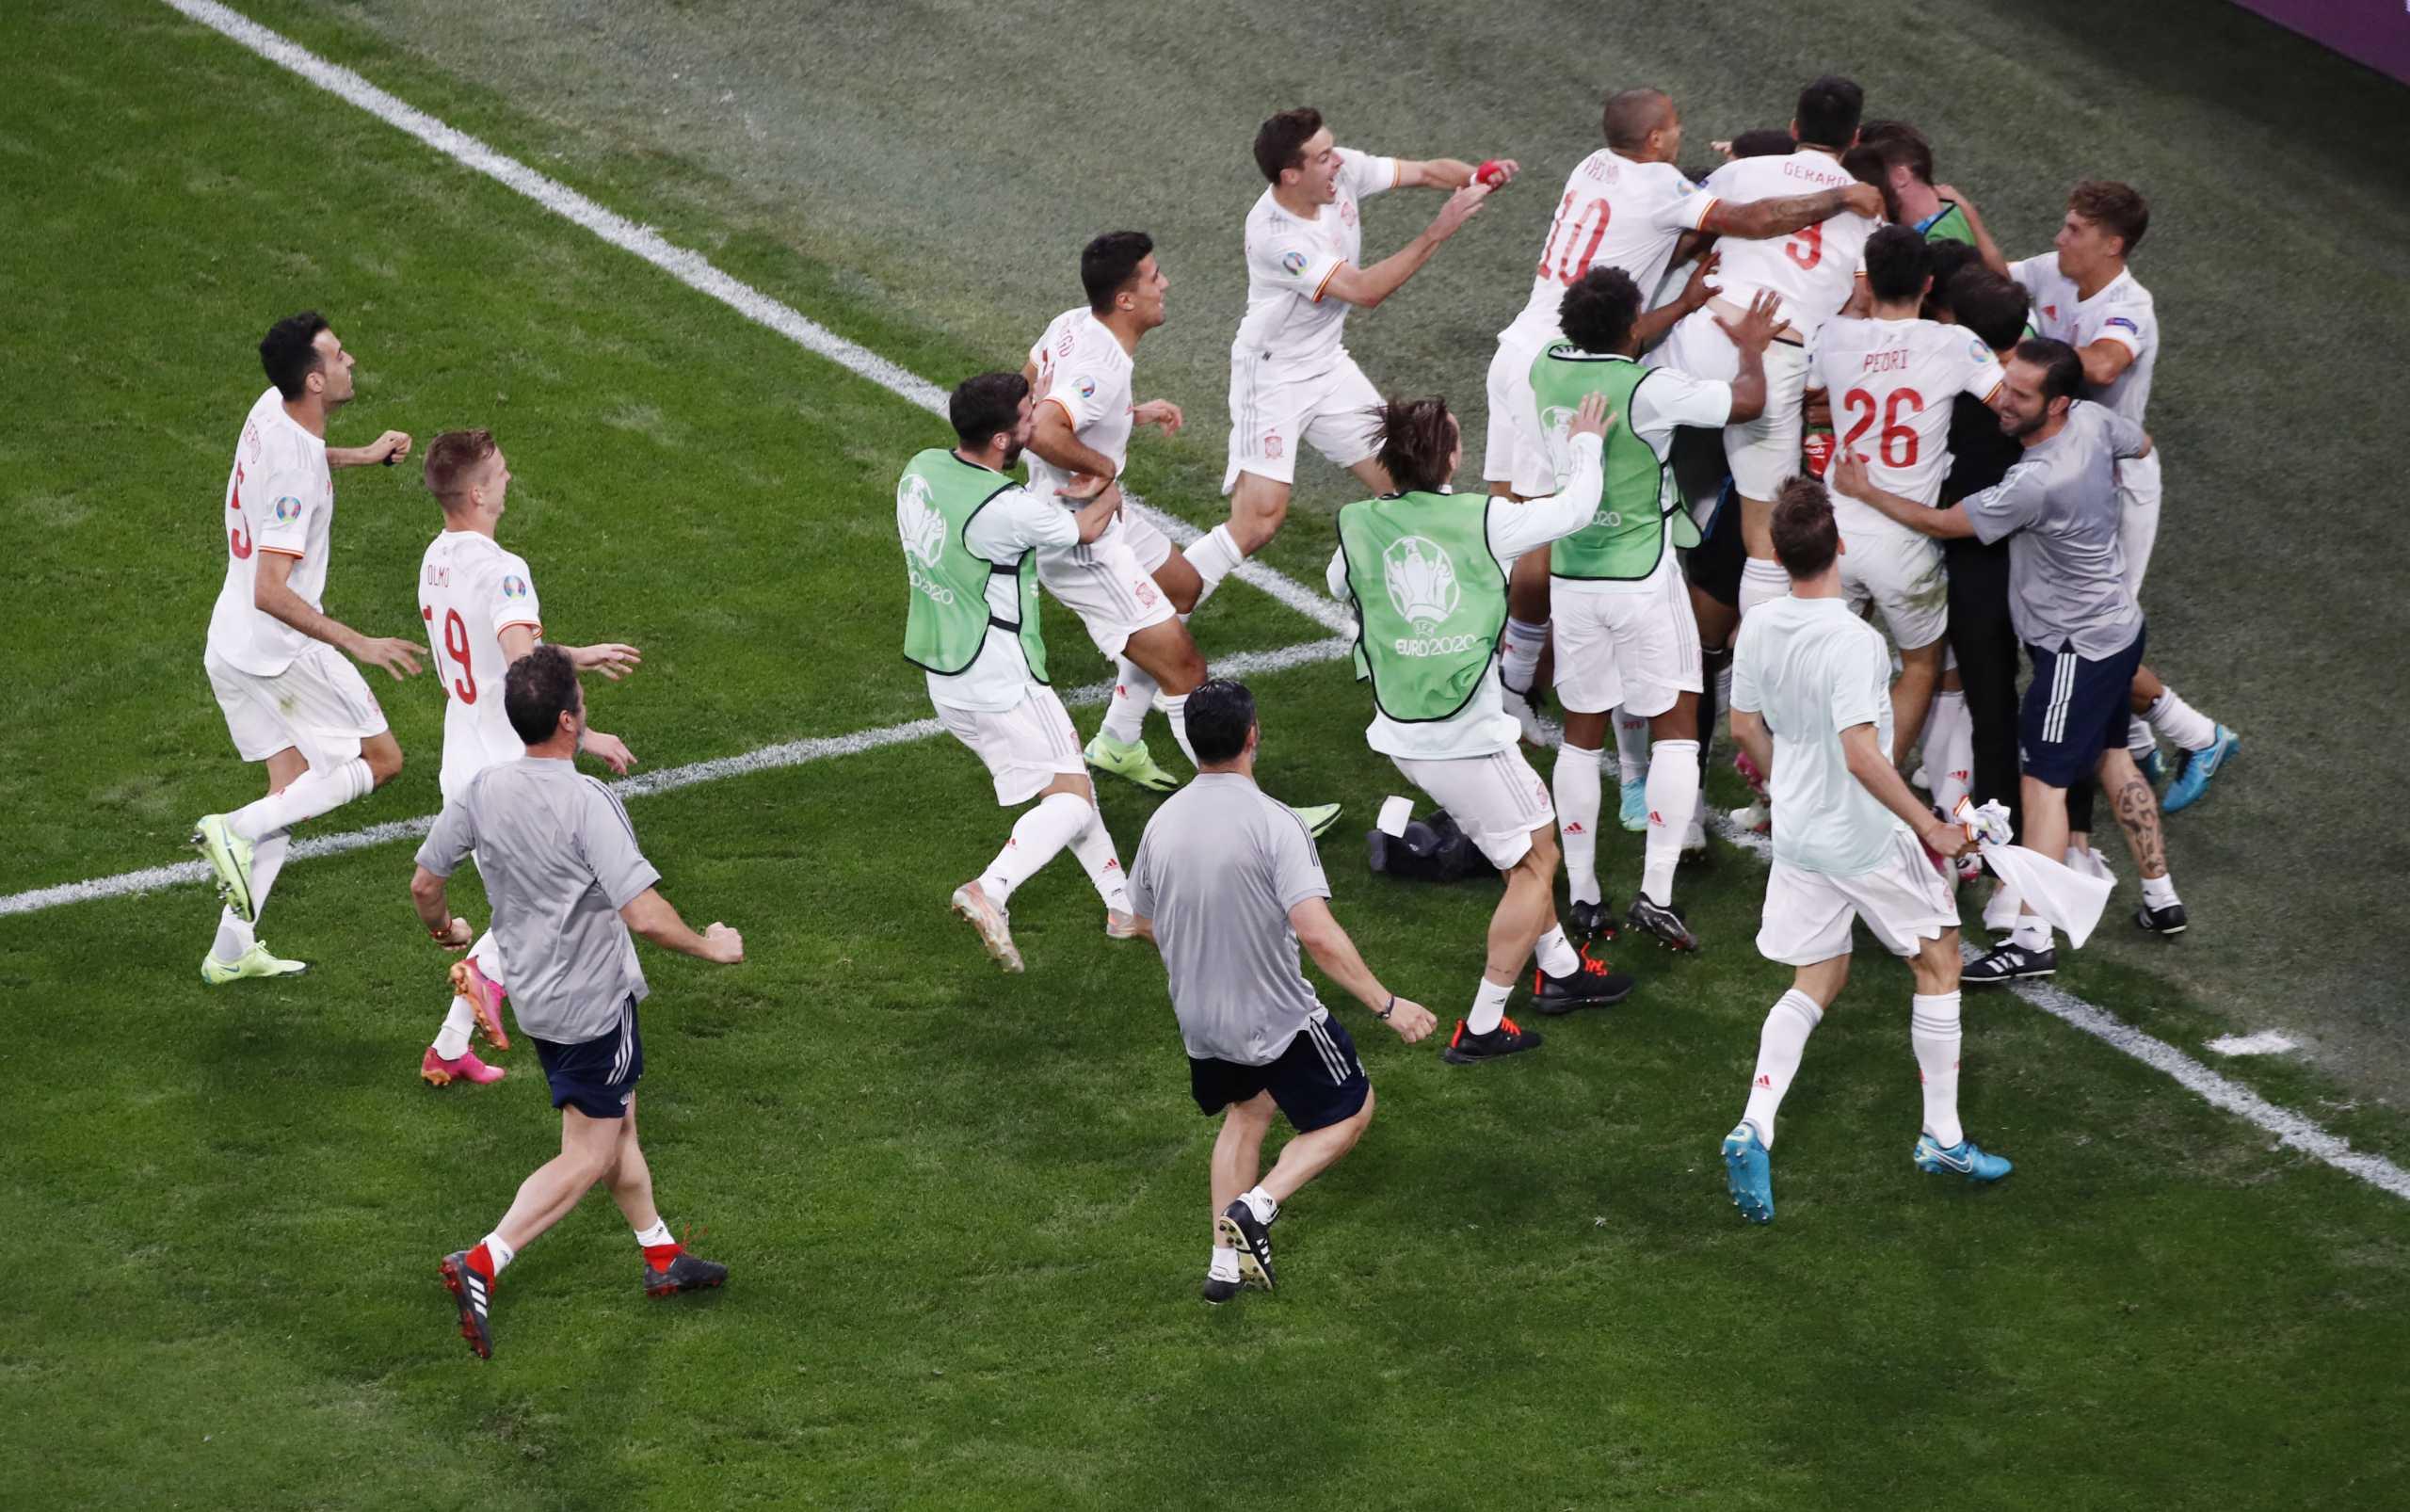 Euro 2020, Ελβετία – Ισπανία: Τα πέναλτι και οι πανηγυρισμοί των Ιβήρων